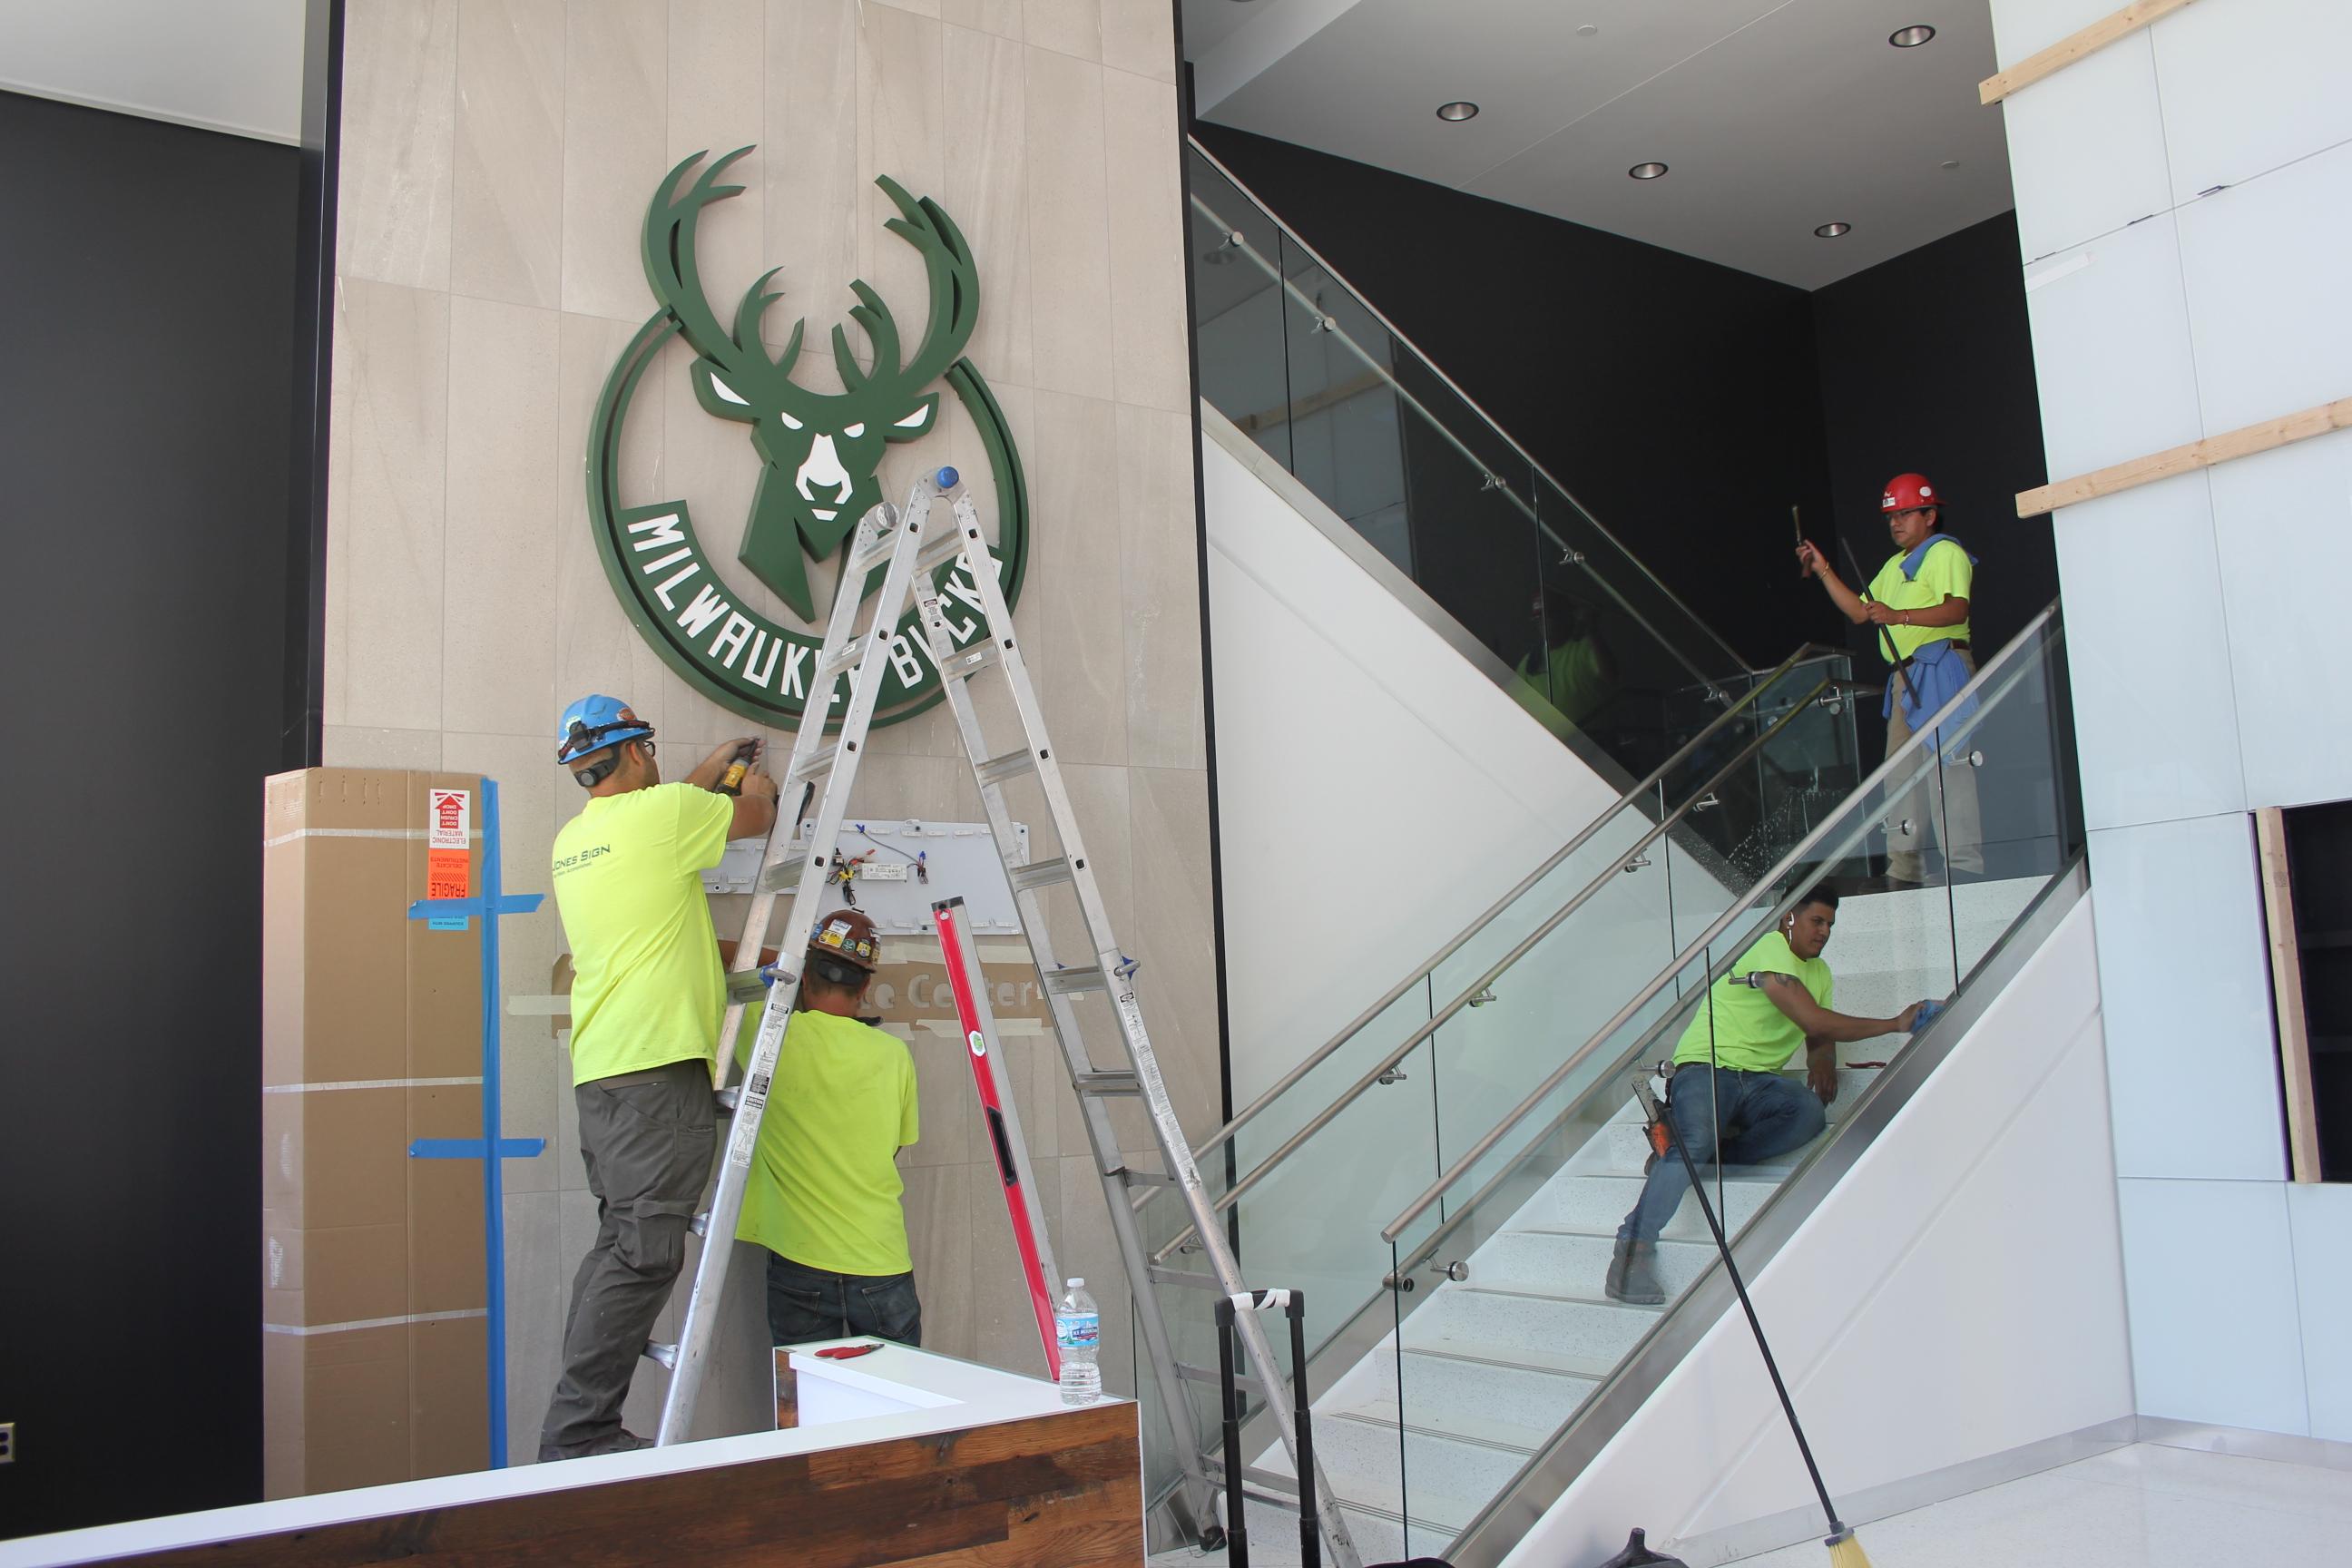 Workers putting on Bucks logo.